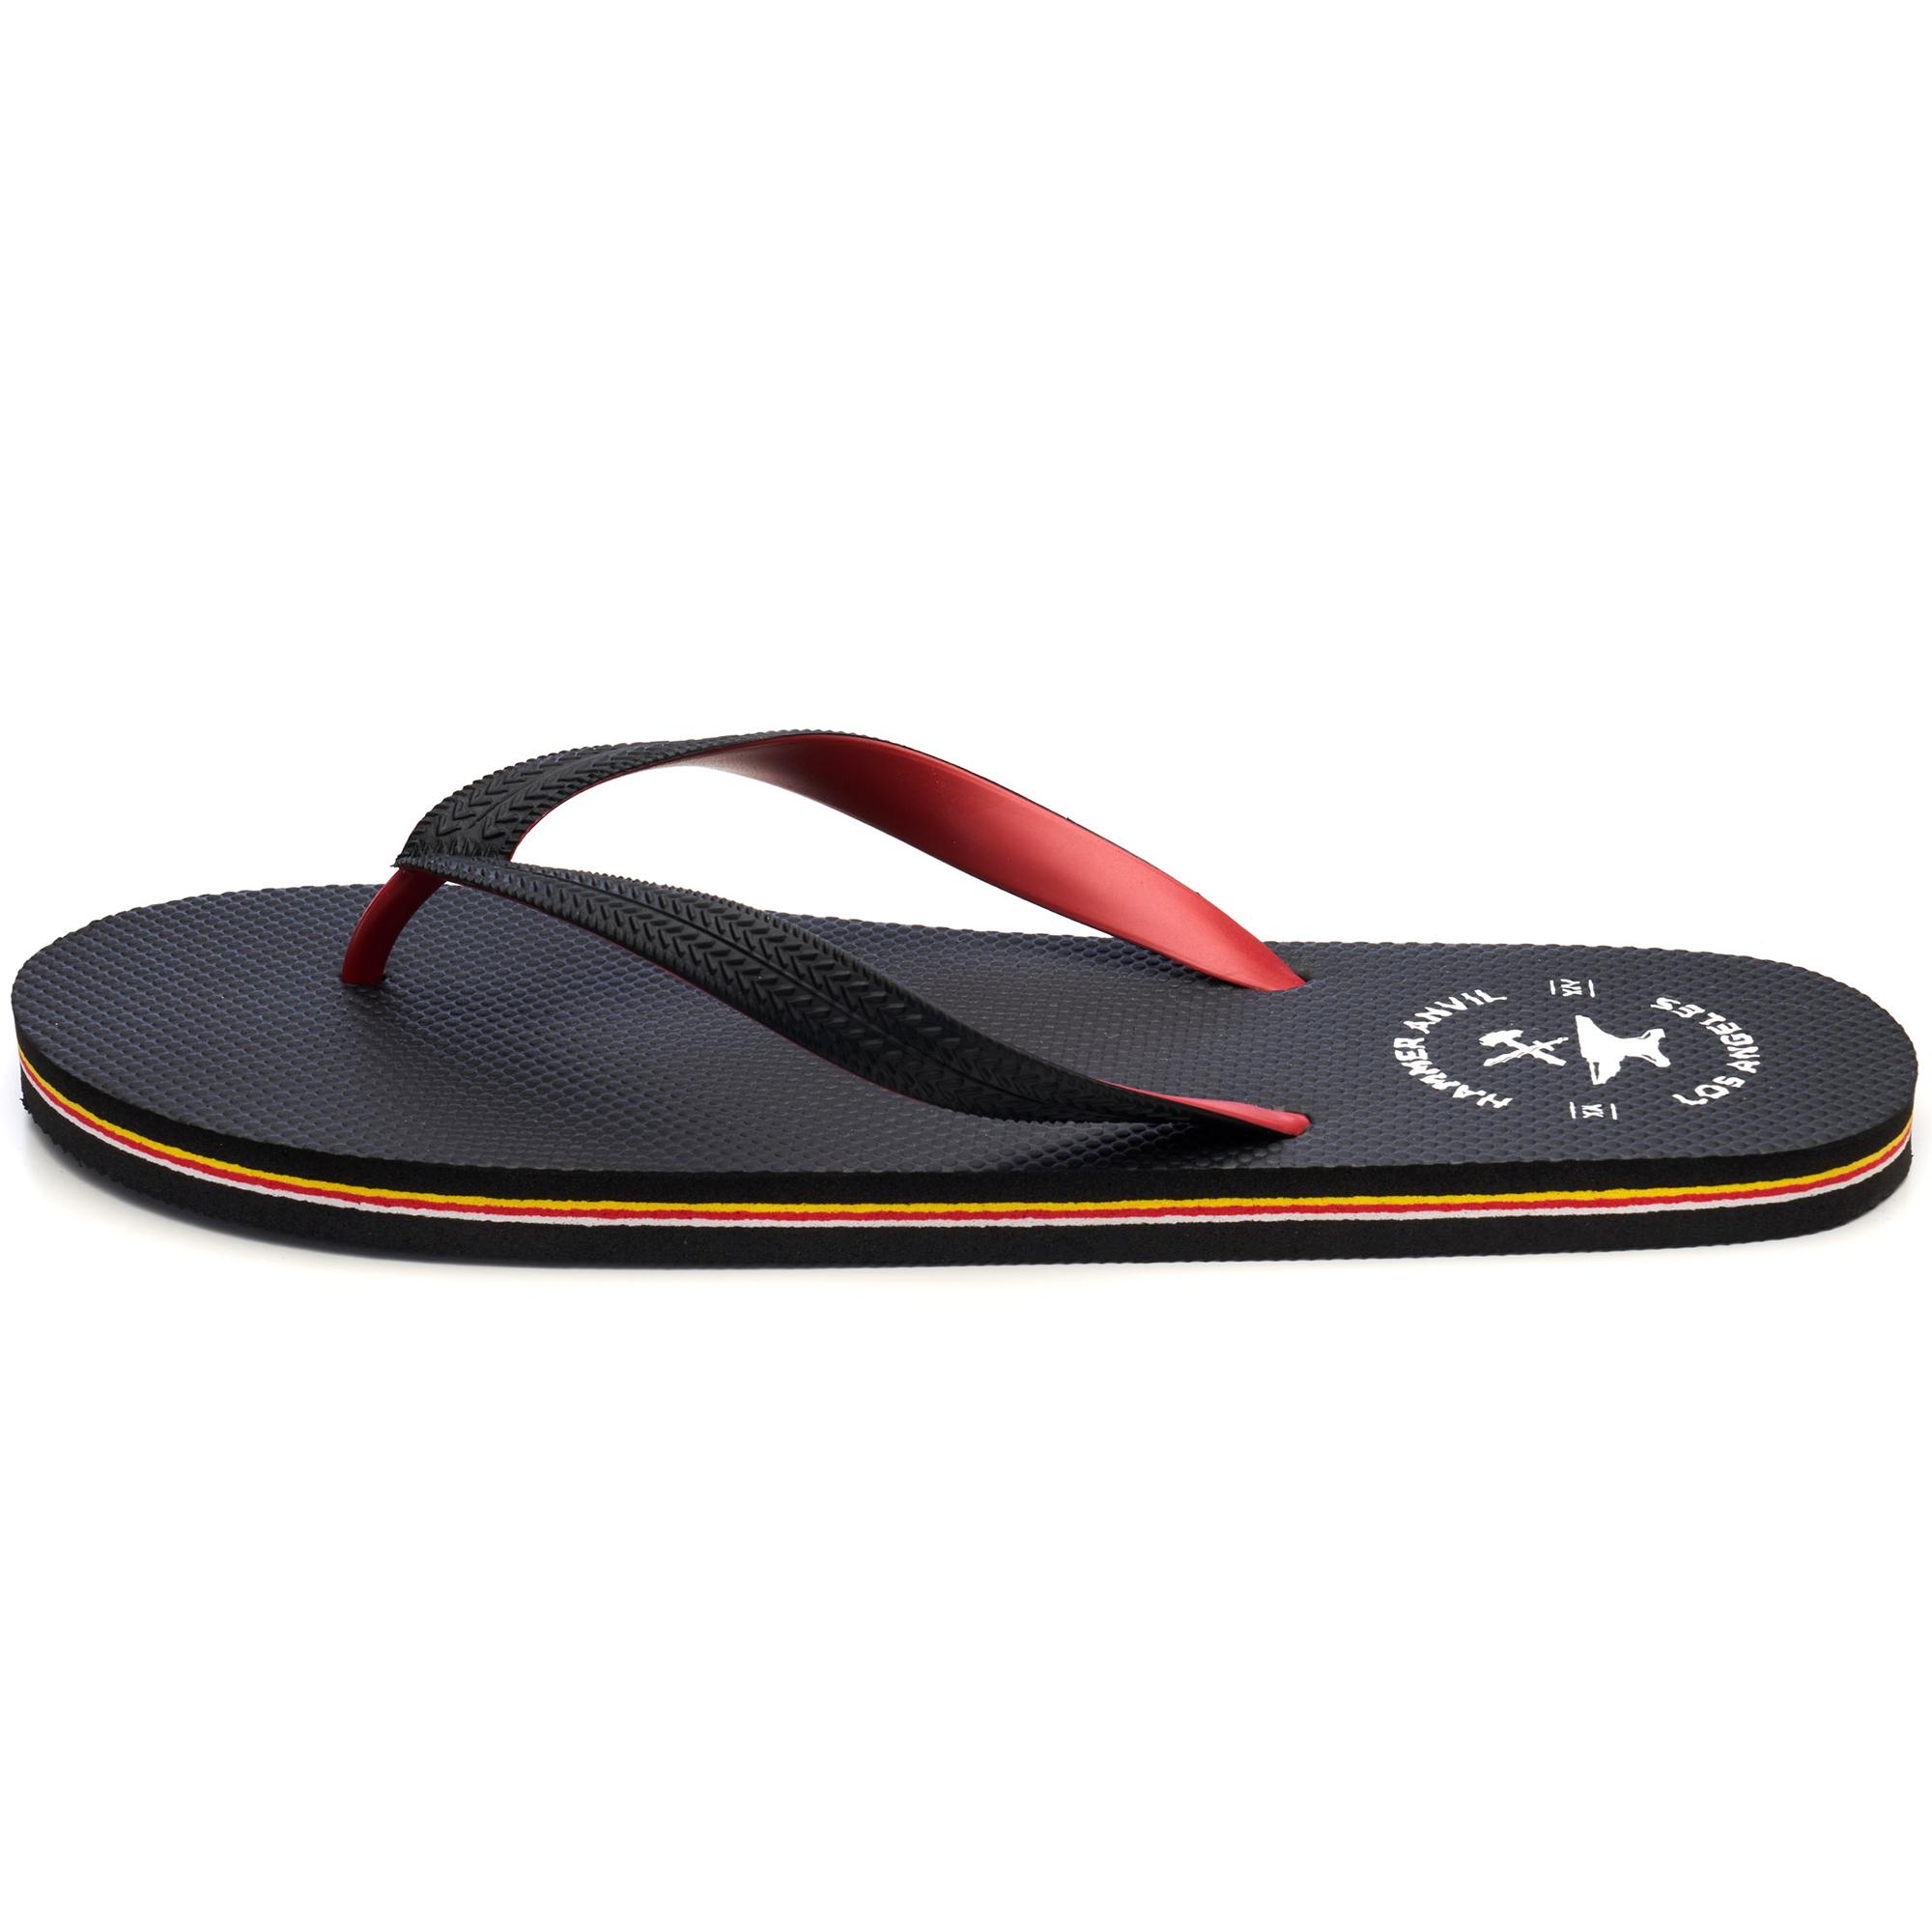 Hammer-Anvil-Mens-Flip-Flops-Casual-Thong-Summer-Sandals-Comfortable-Beach-Shoes thumbnail 31